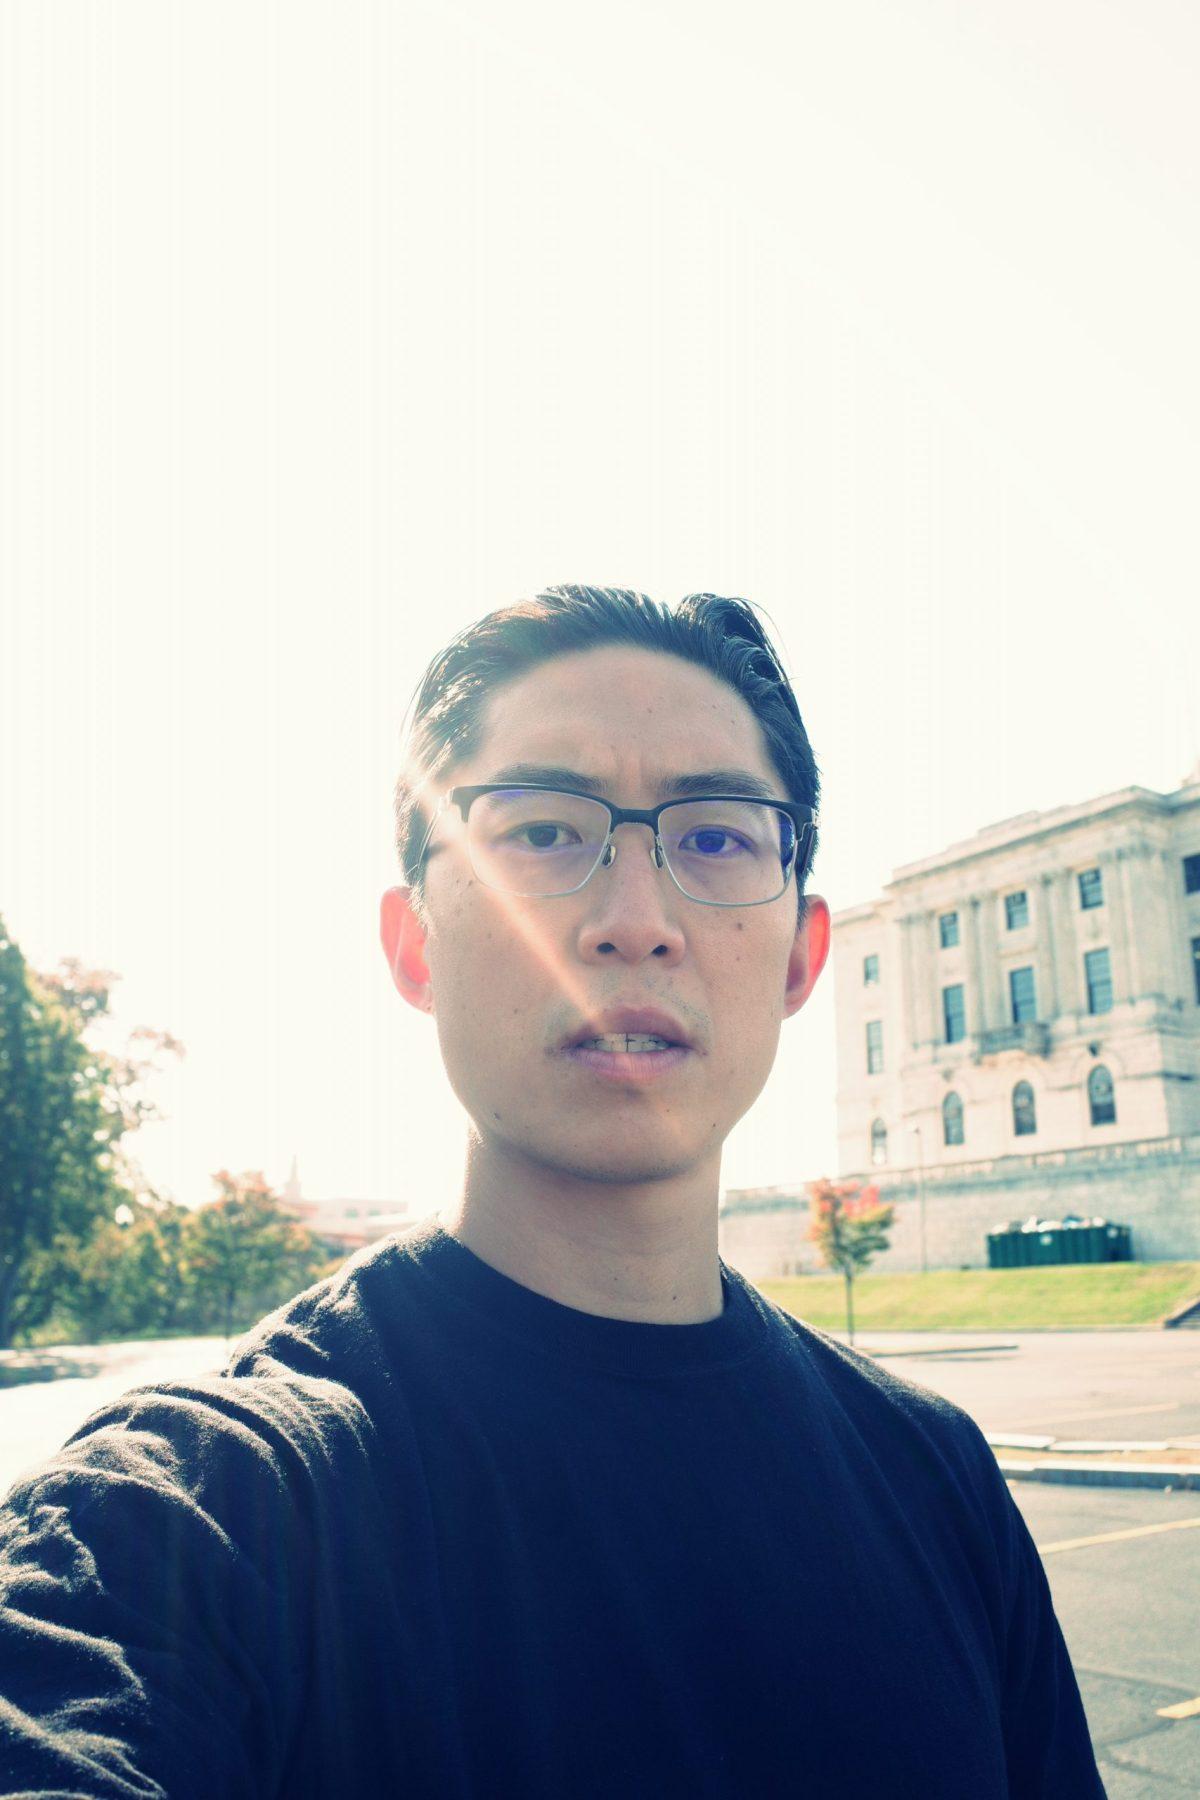 selfie epic light ERIC KIM a